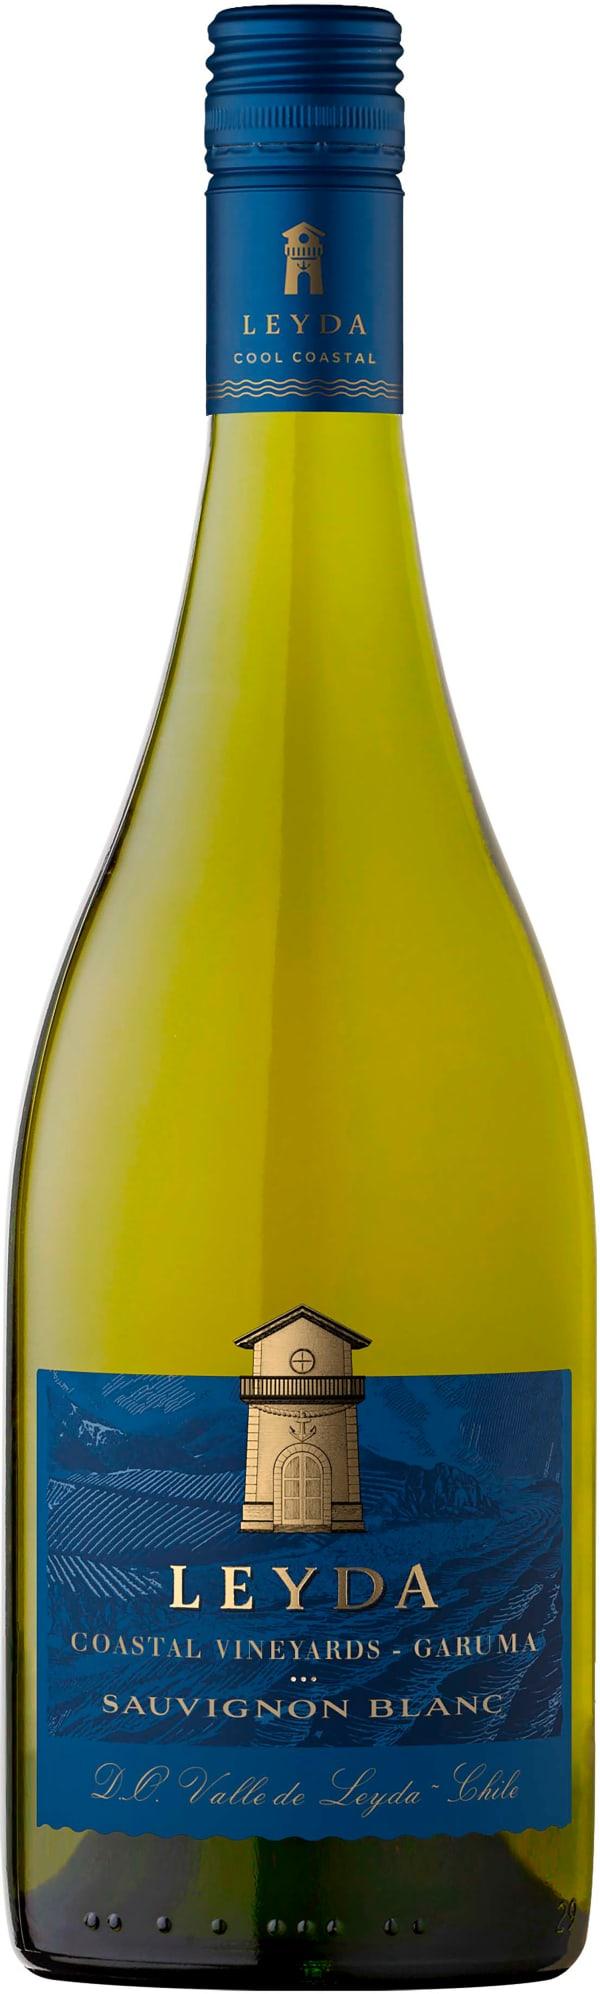 Leyda Garuma Vineyard Sauvignon Blanc 2017